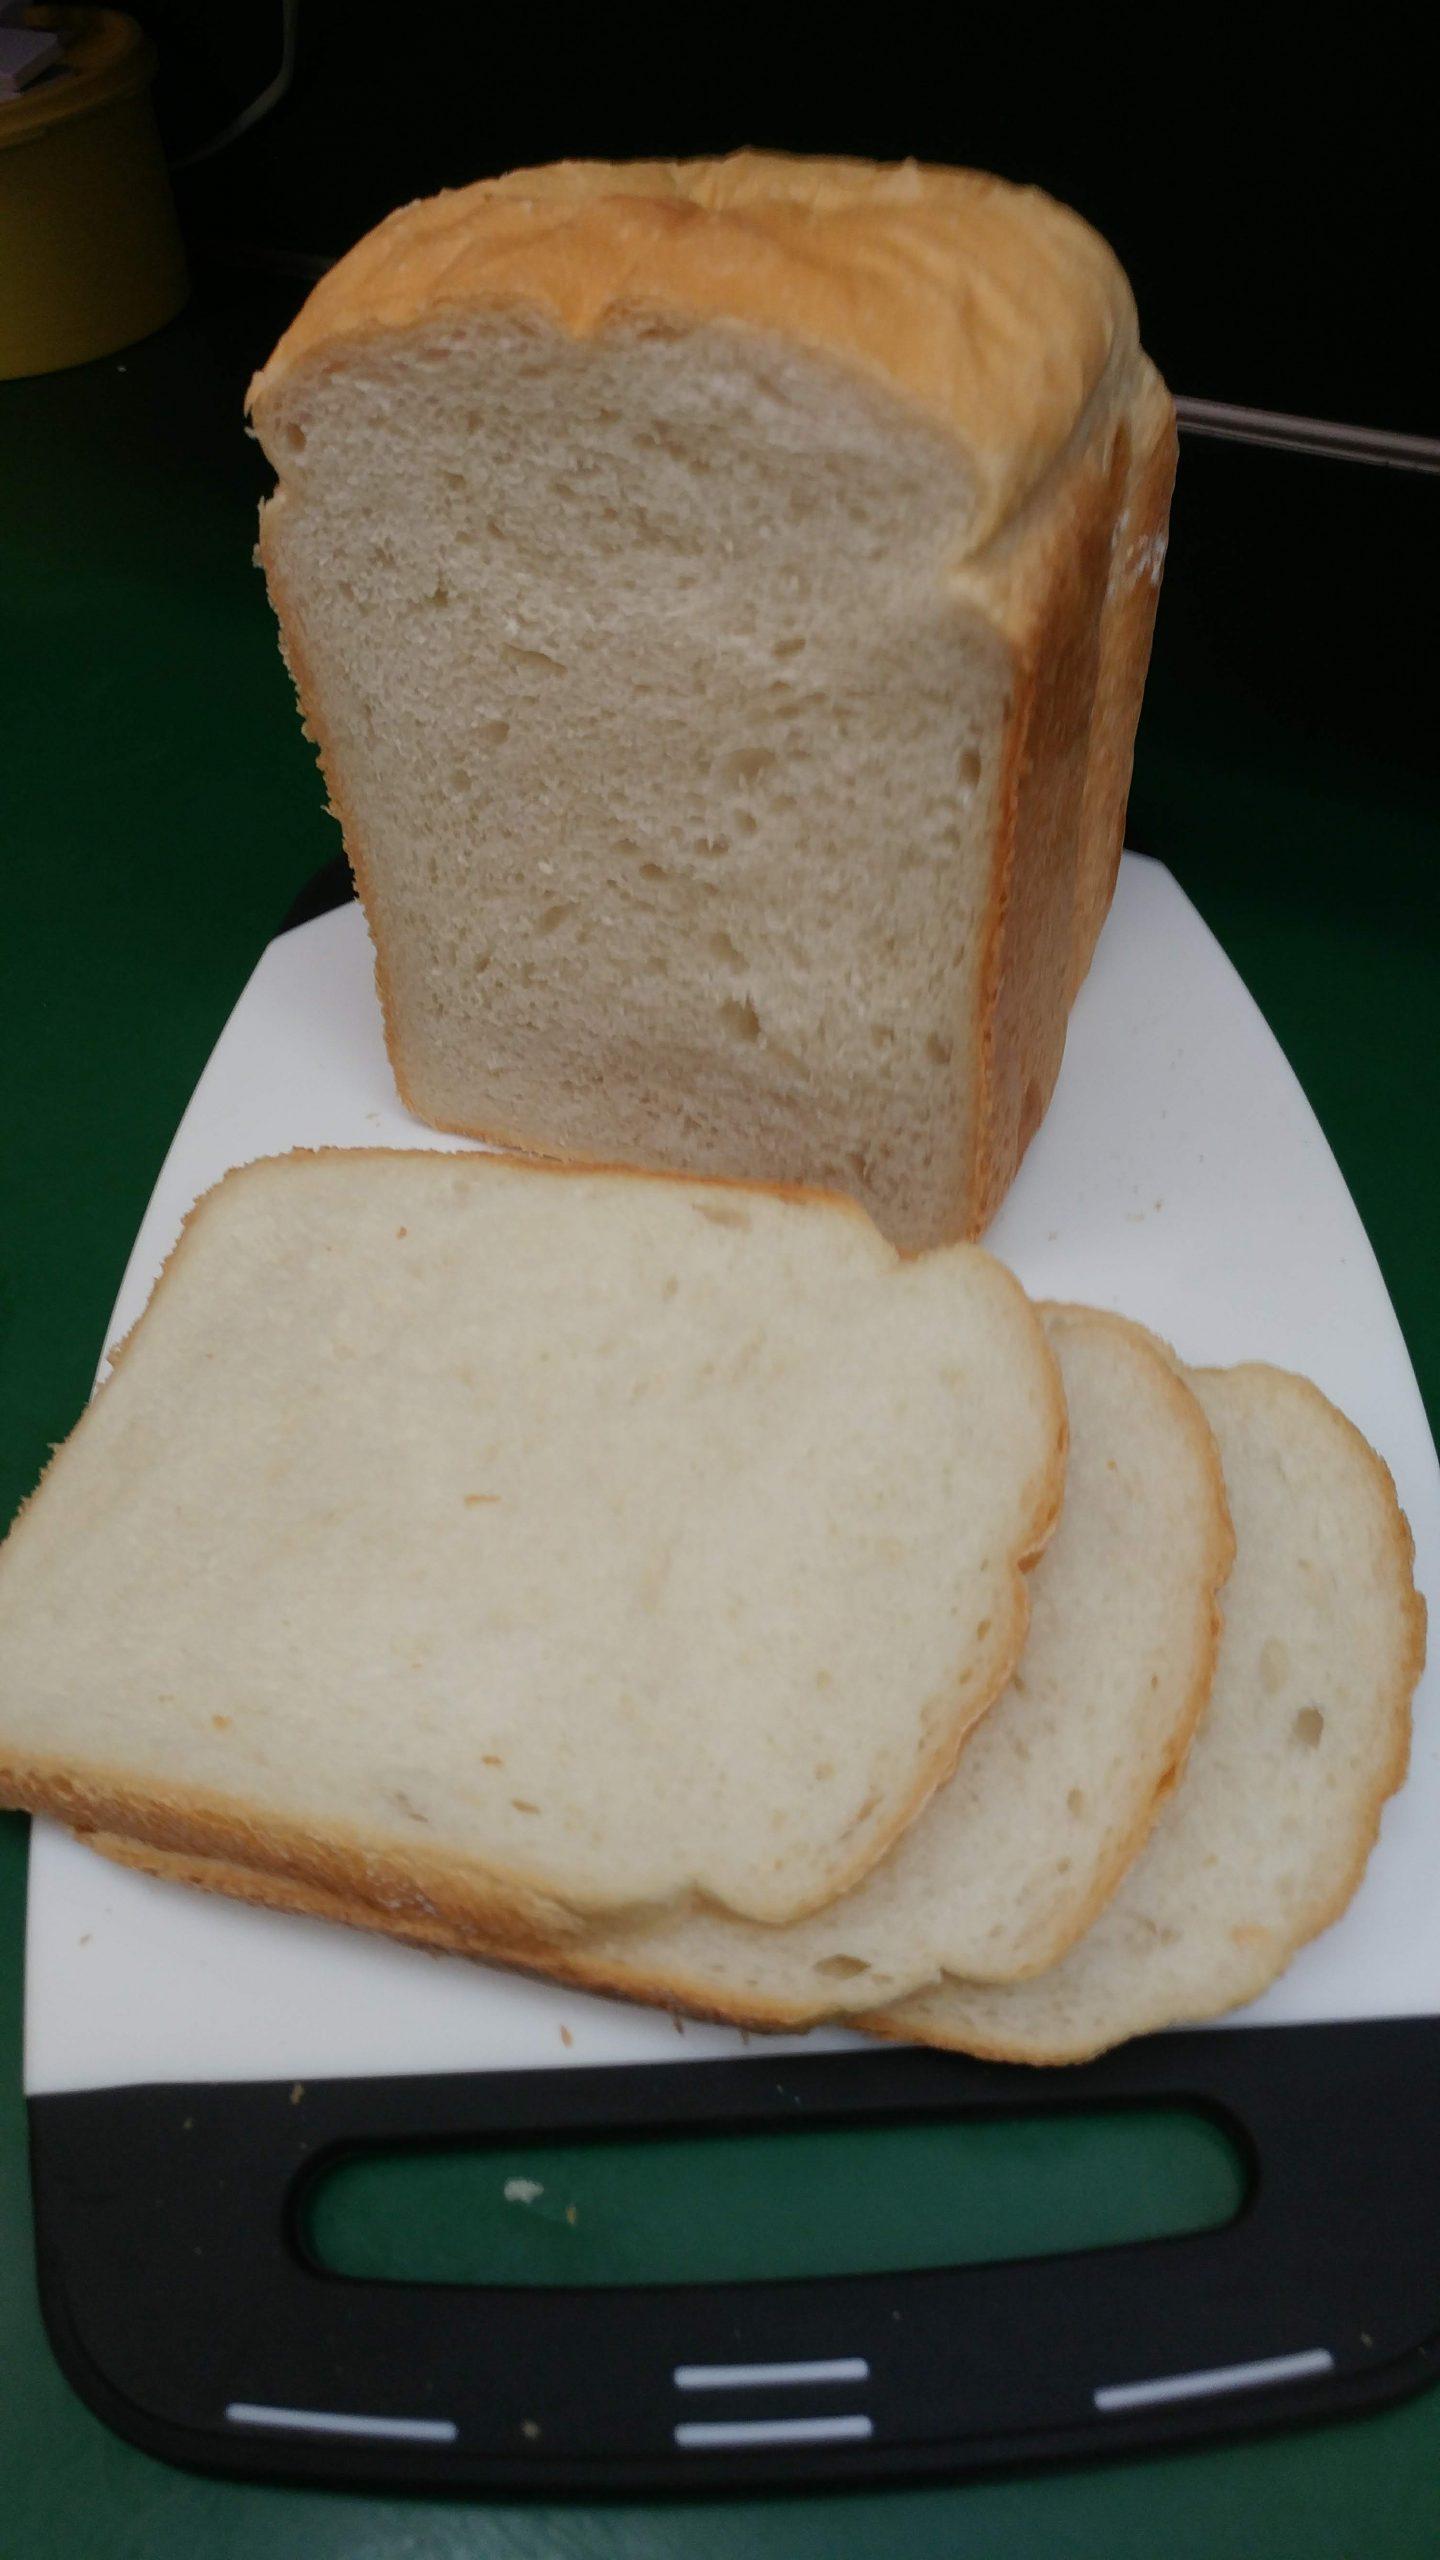 Reduced Sodium Bread Recipe